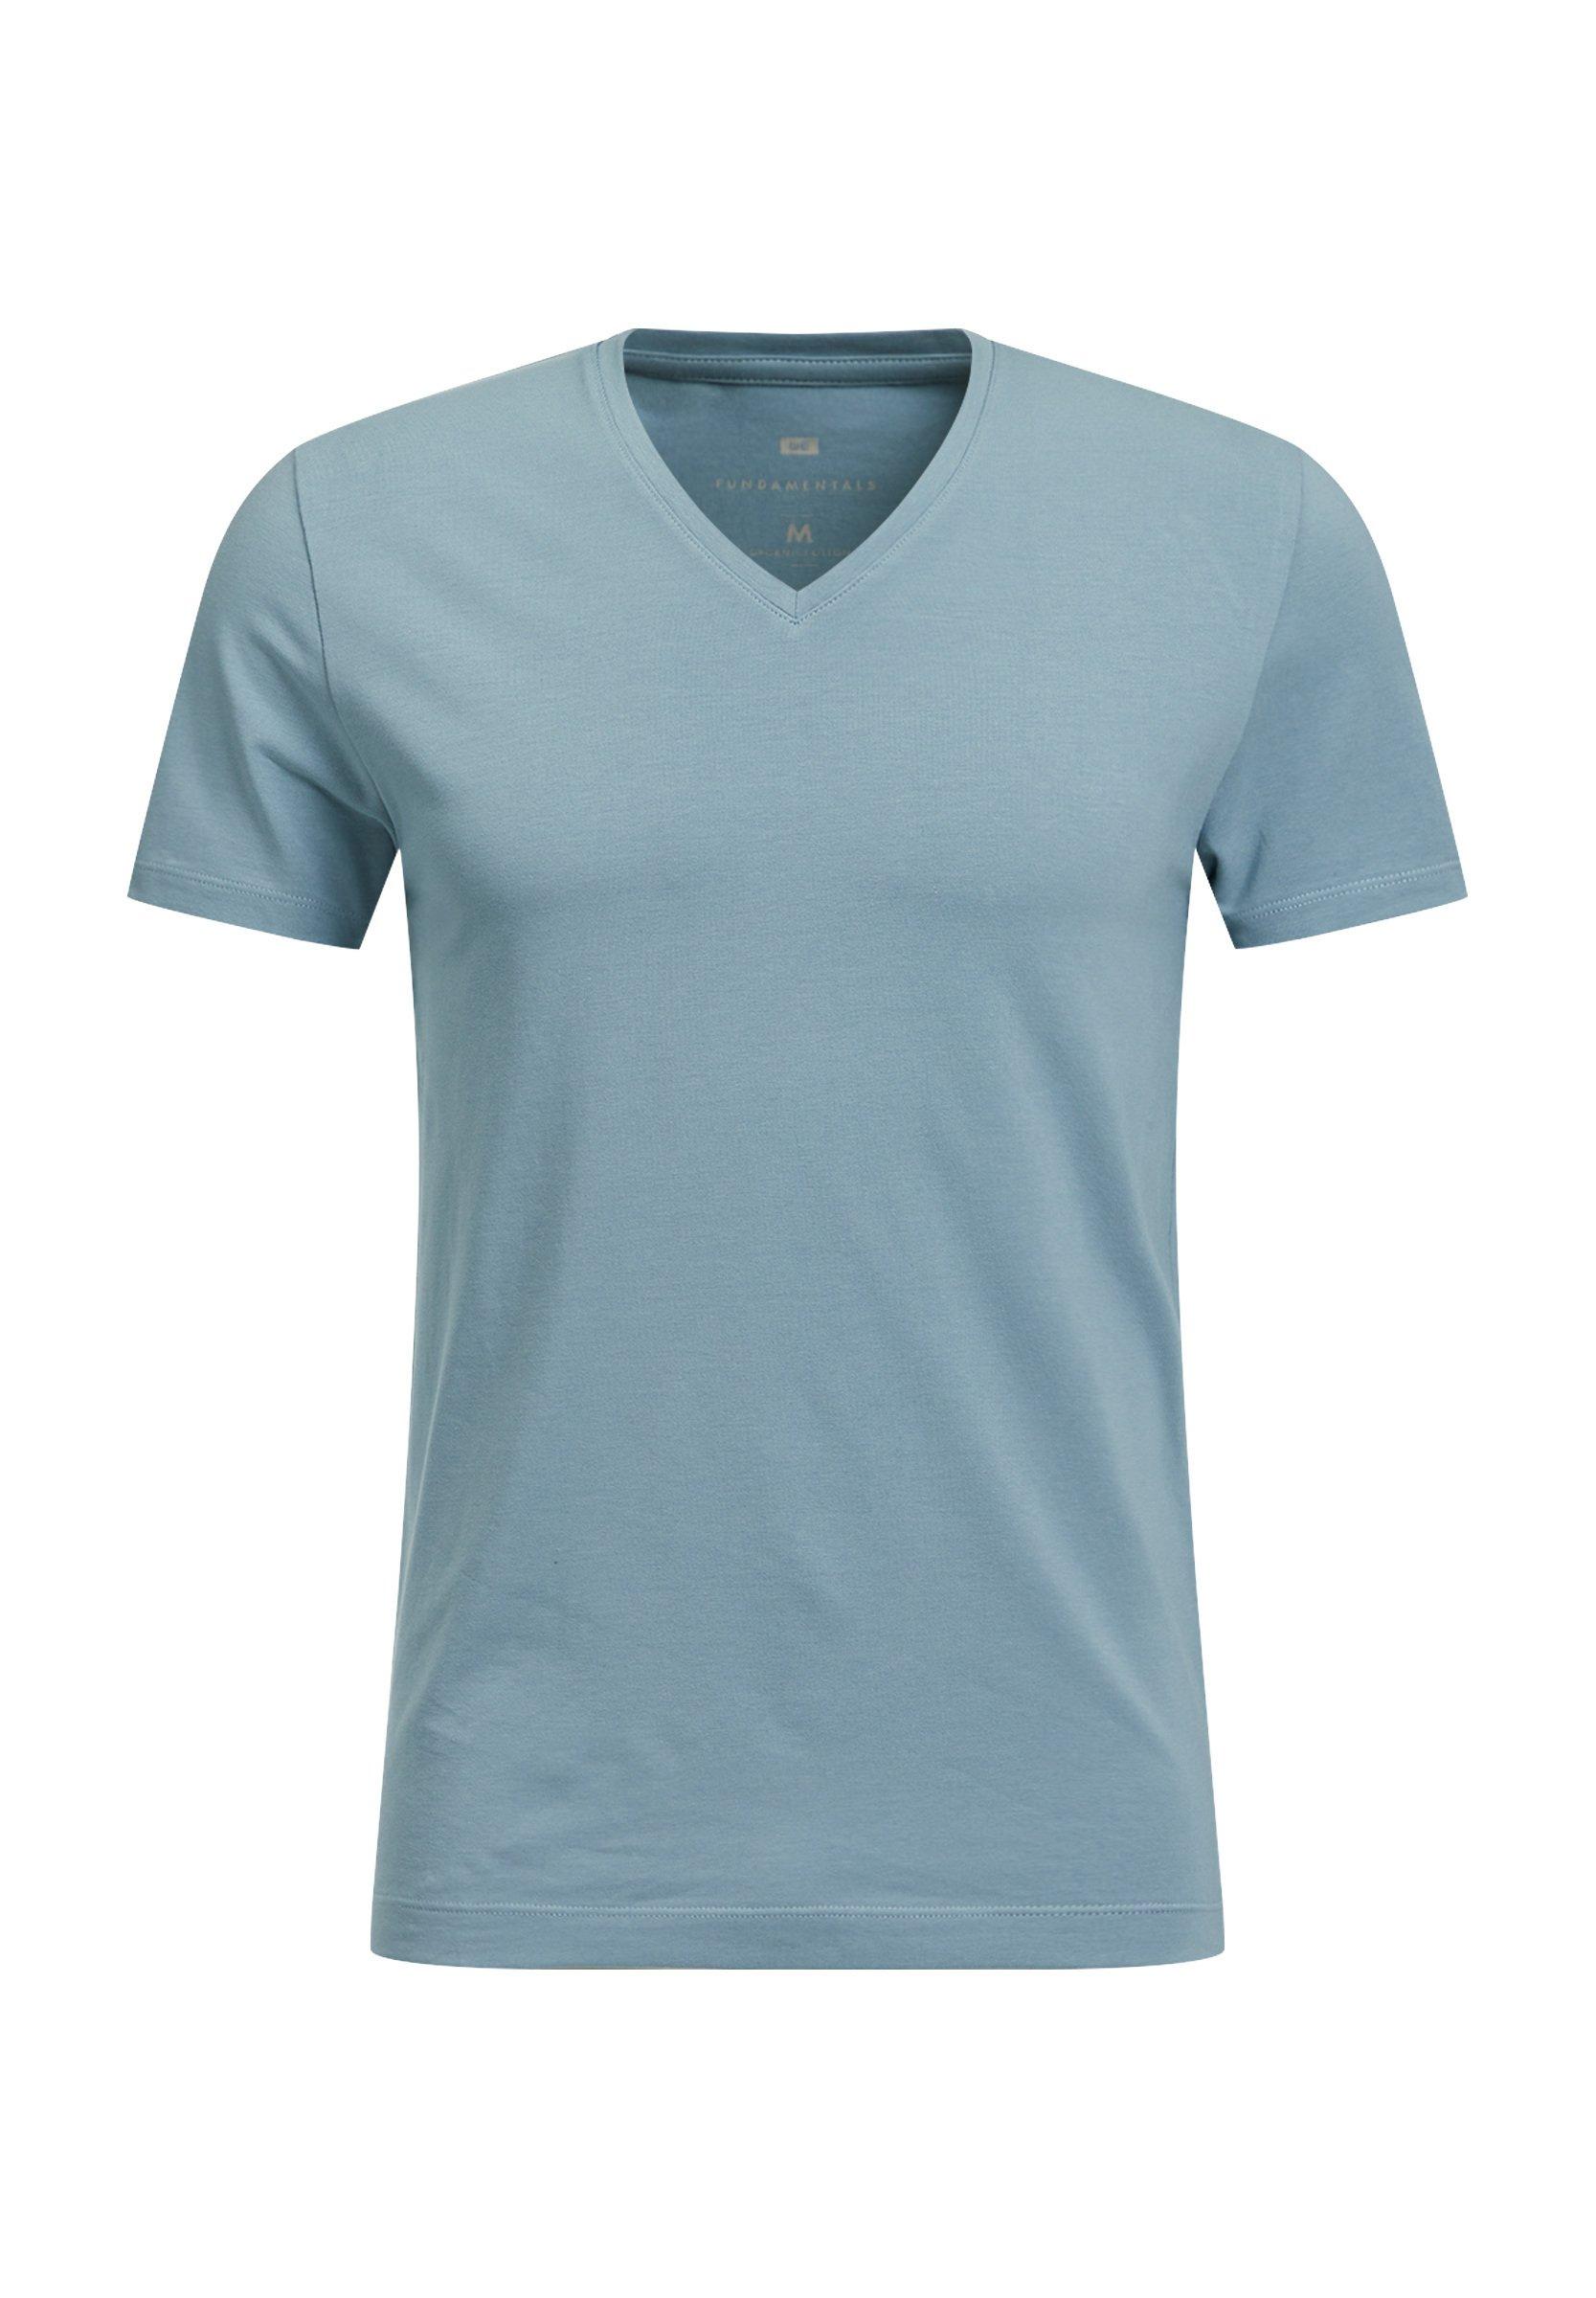 We Fashion T-shirt Basic - Moss Green